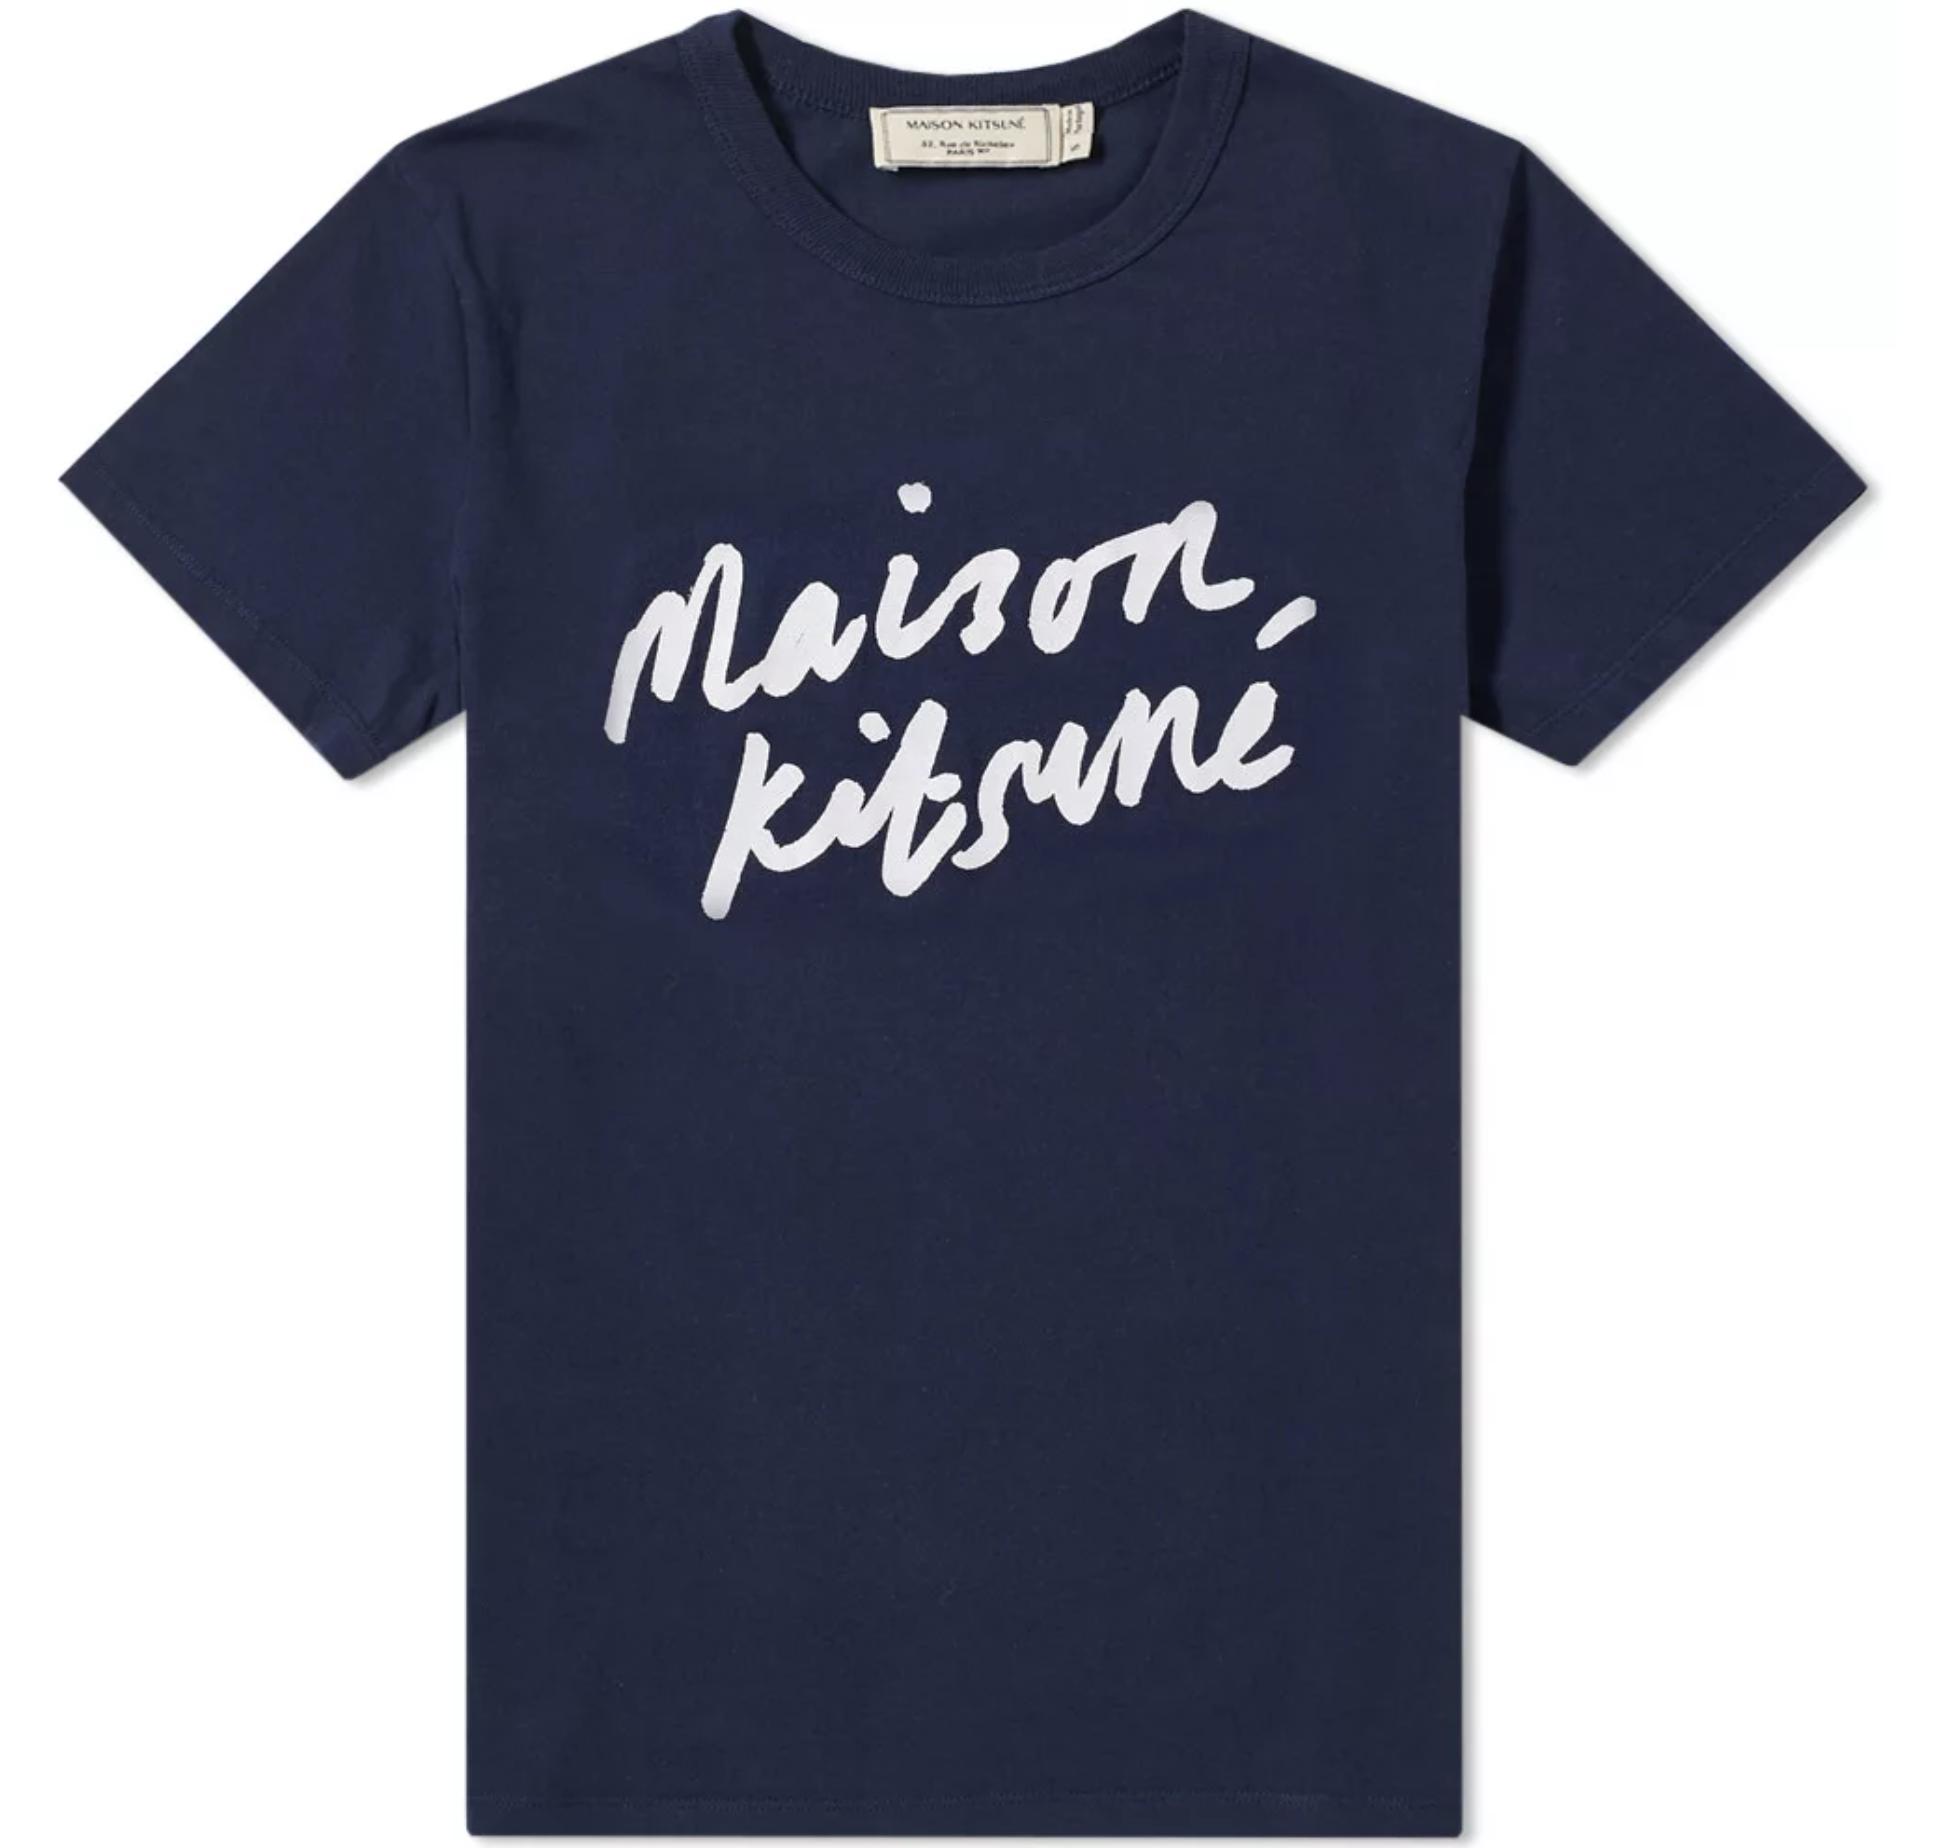 7. Handwriting Tee - Brand: Maison KitsunéPrice: $69.00